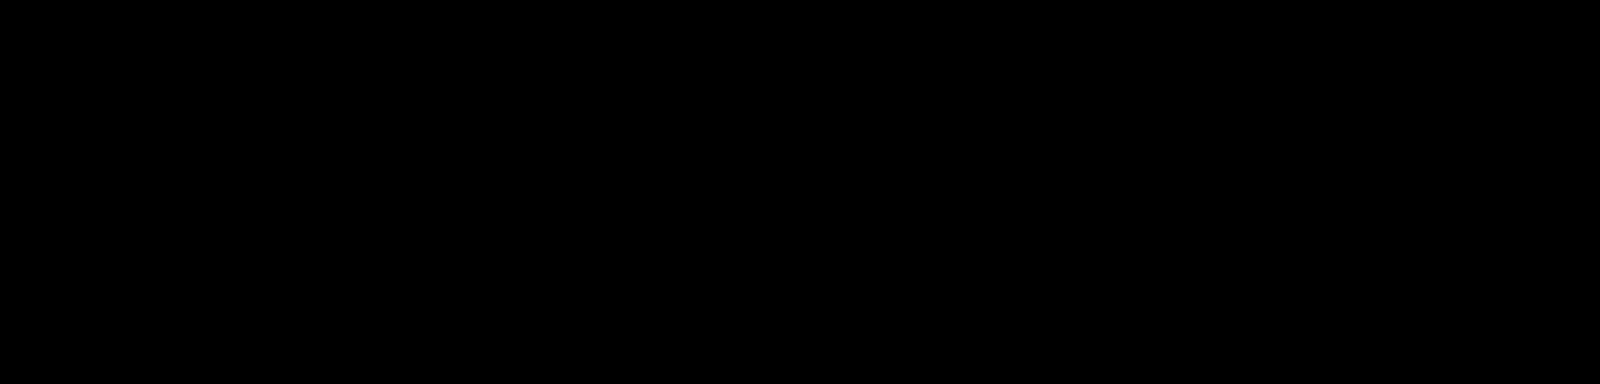 retailer-logo-magasin-500x120-300dpi